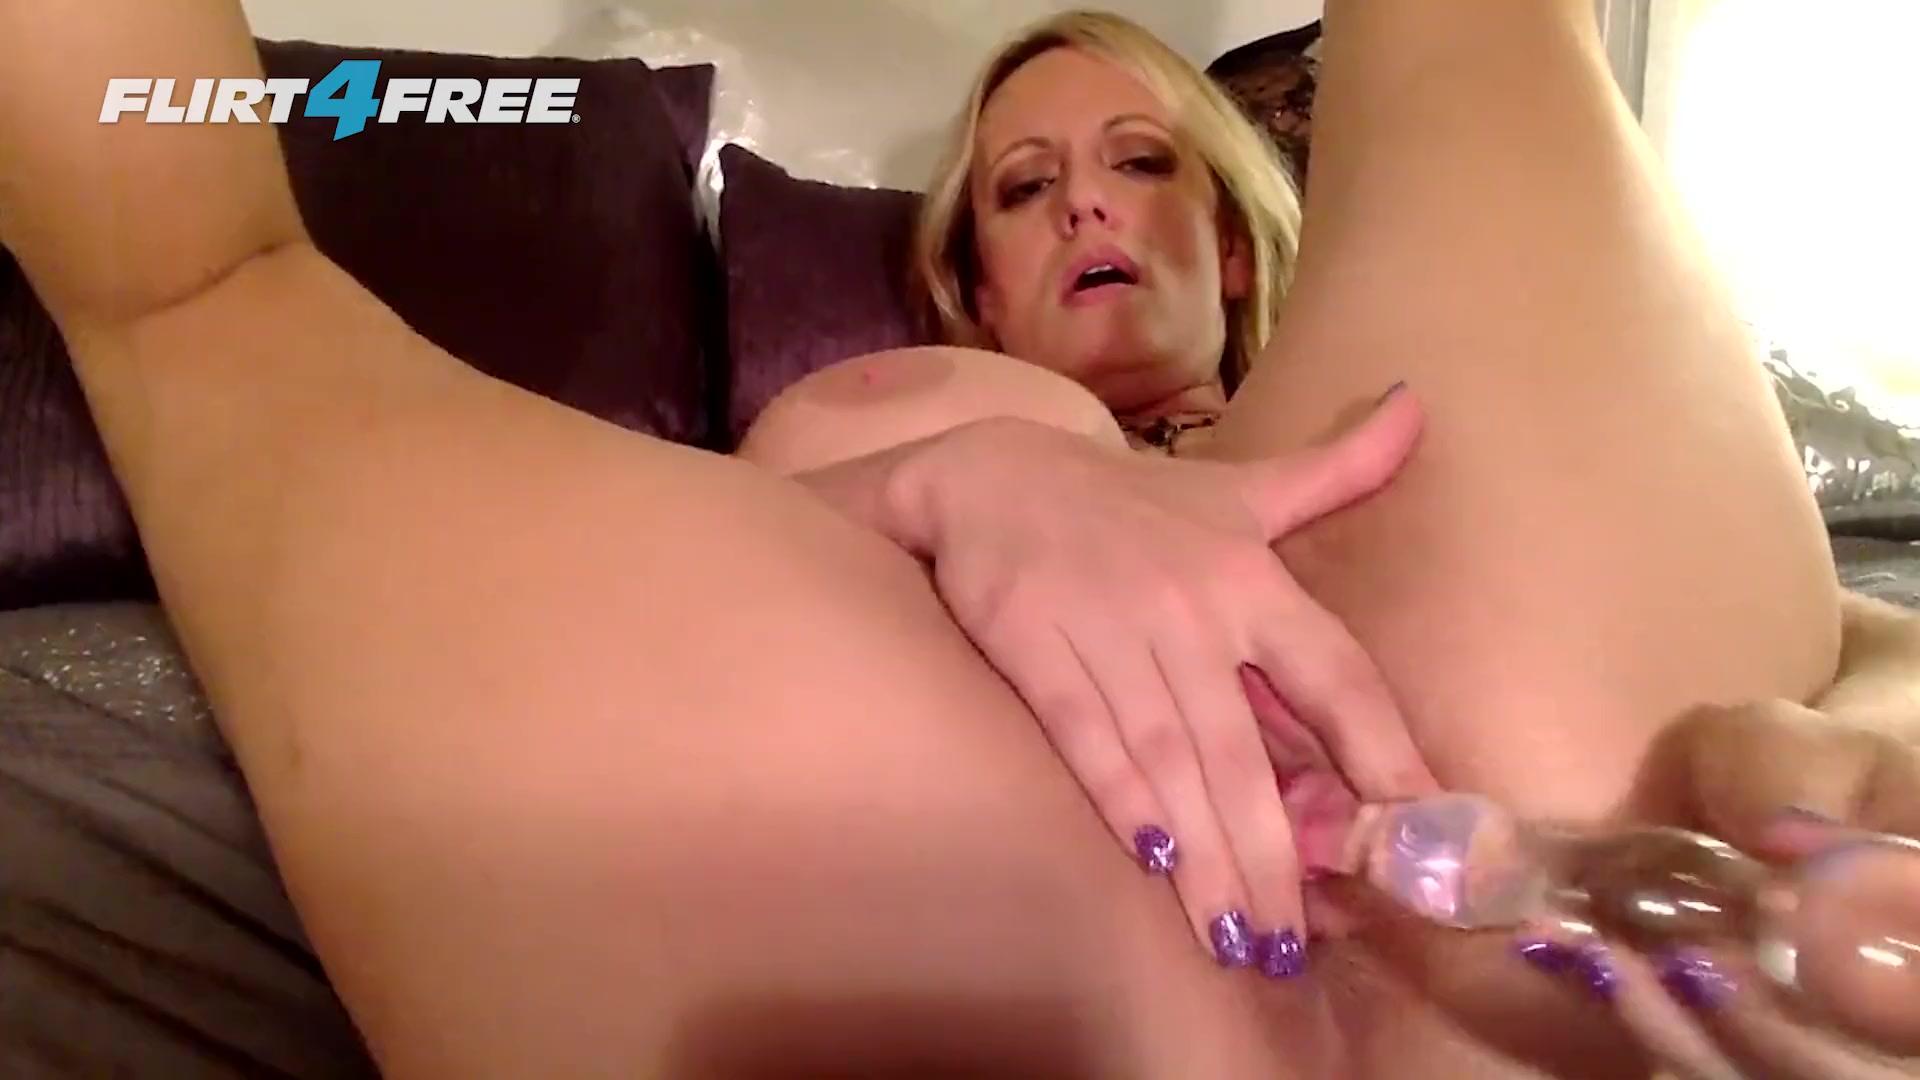 mature women sex free download